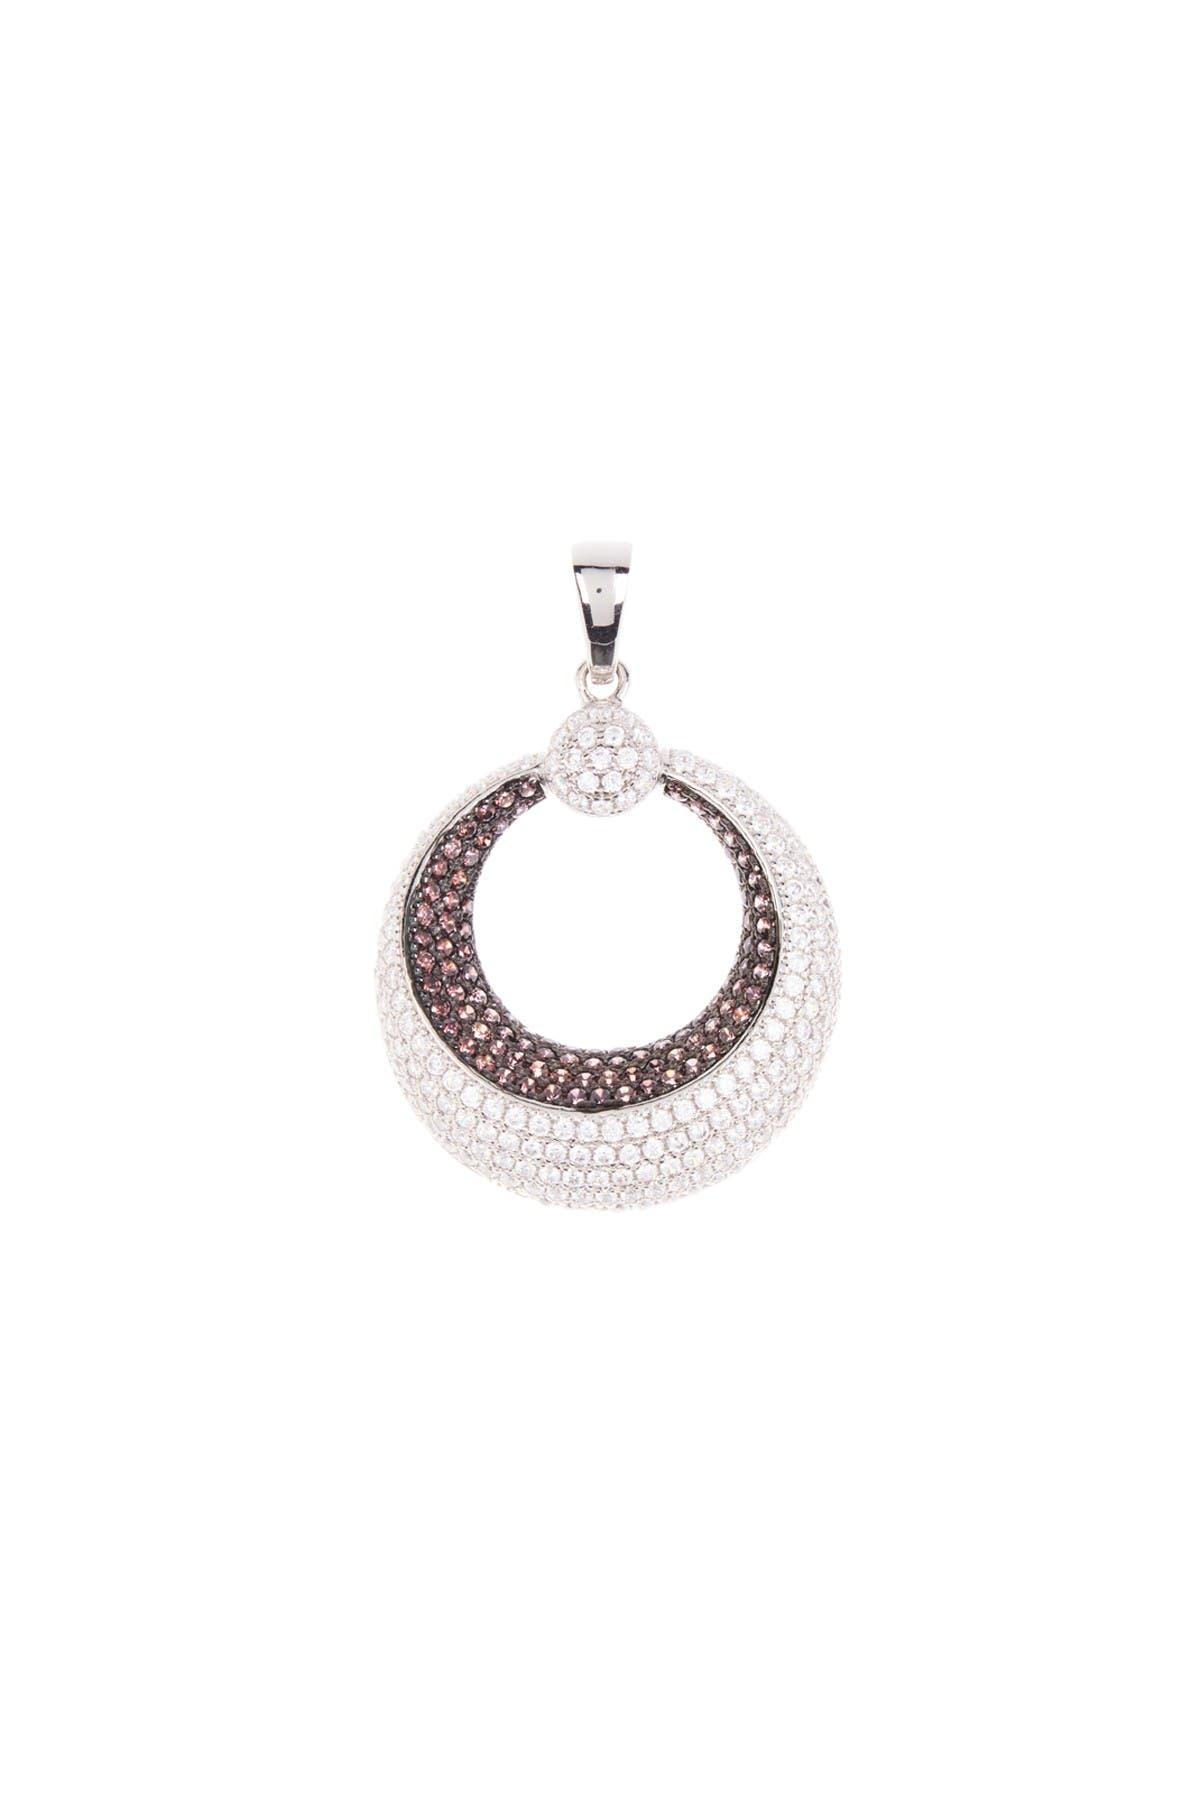 Image of BREUNING Circular Geometric Cubic Zirconia Pendant Necklace